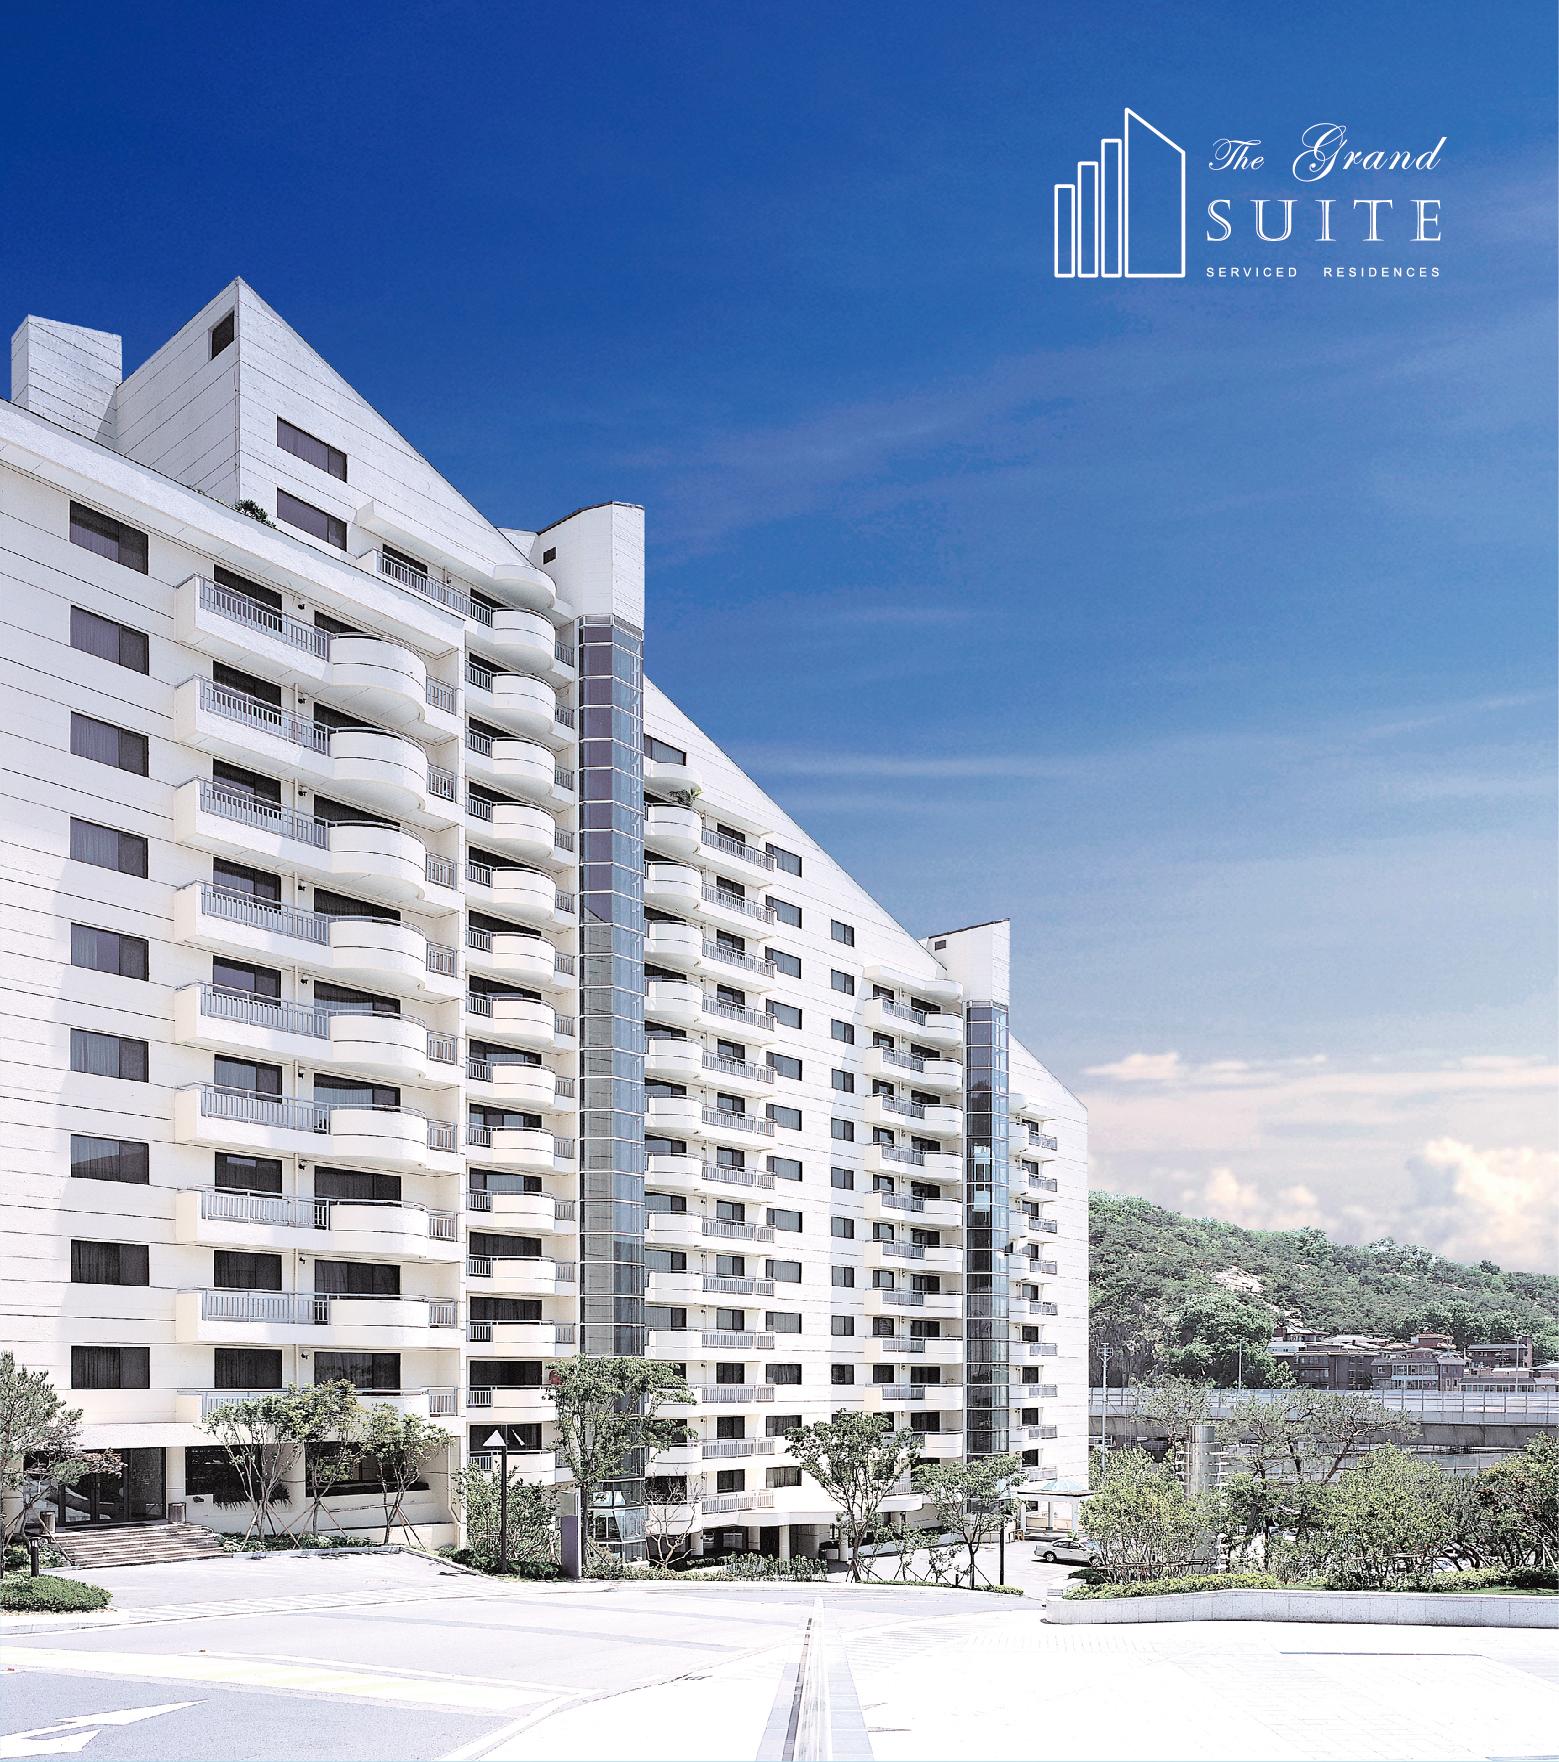 The Grand Suite Residence Seoul, Eun-pyeong